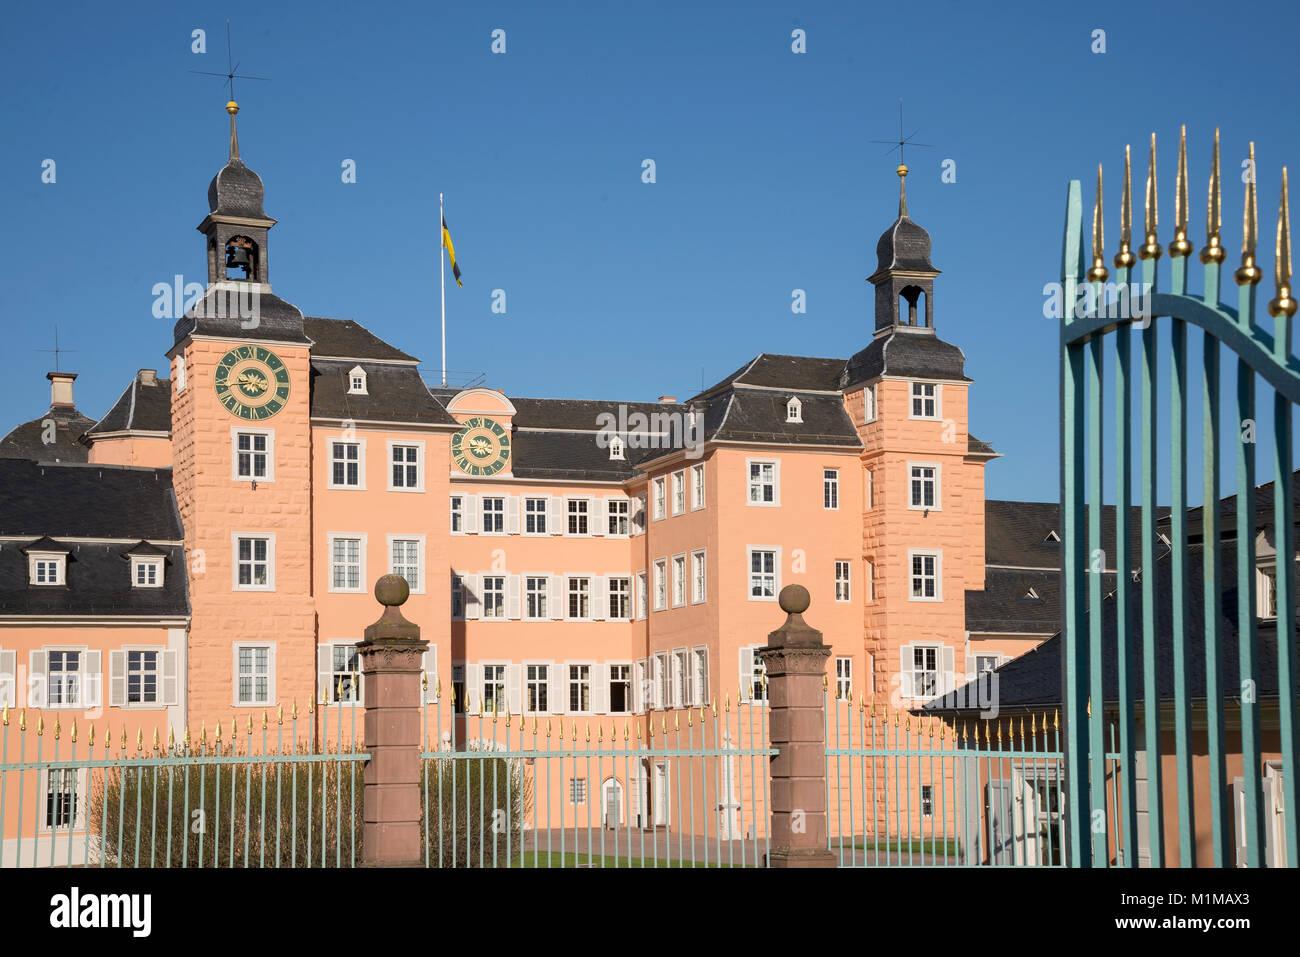 Schloss Schwetzingen, Schwetzingen- Palace, Schwetzingen, Baden-Wurttemberg, Germany, Europe - Stock Image